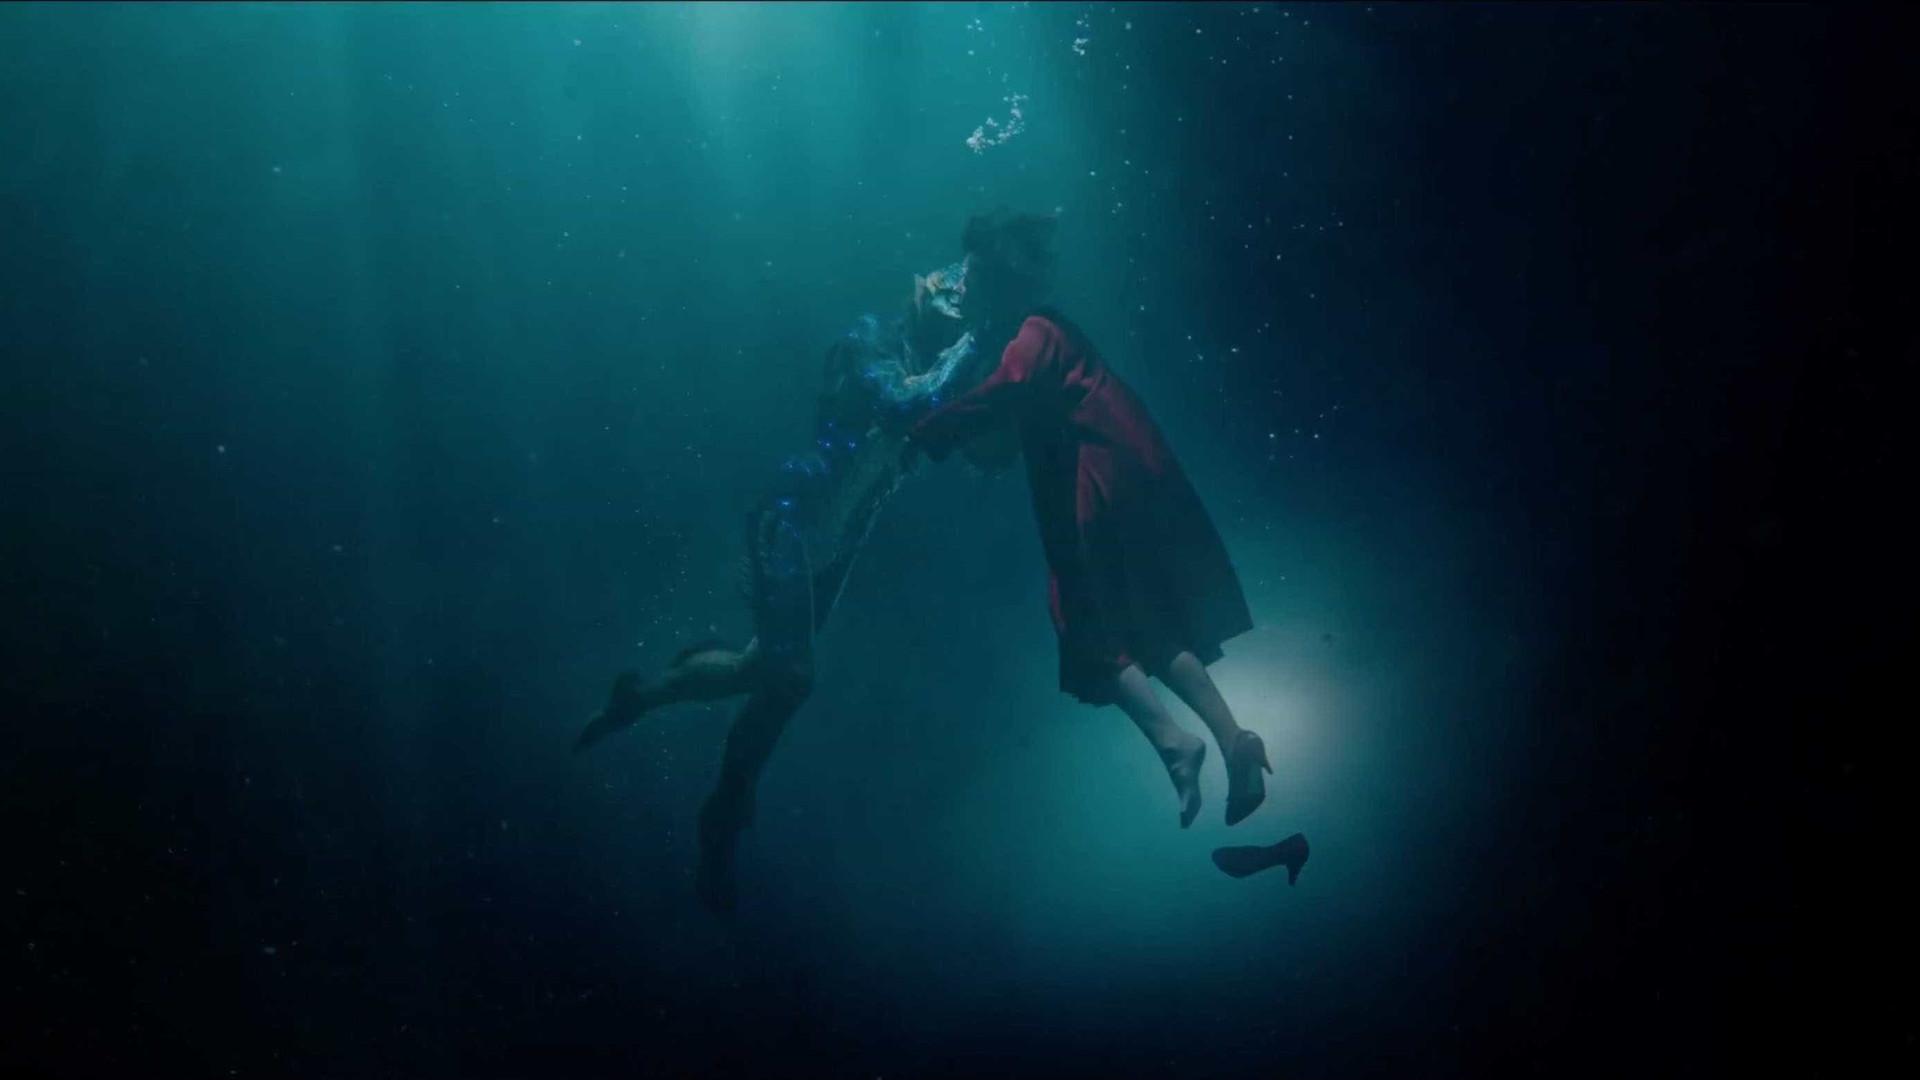 Premiado filme de Guillermo del Toro será lançado como livro